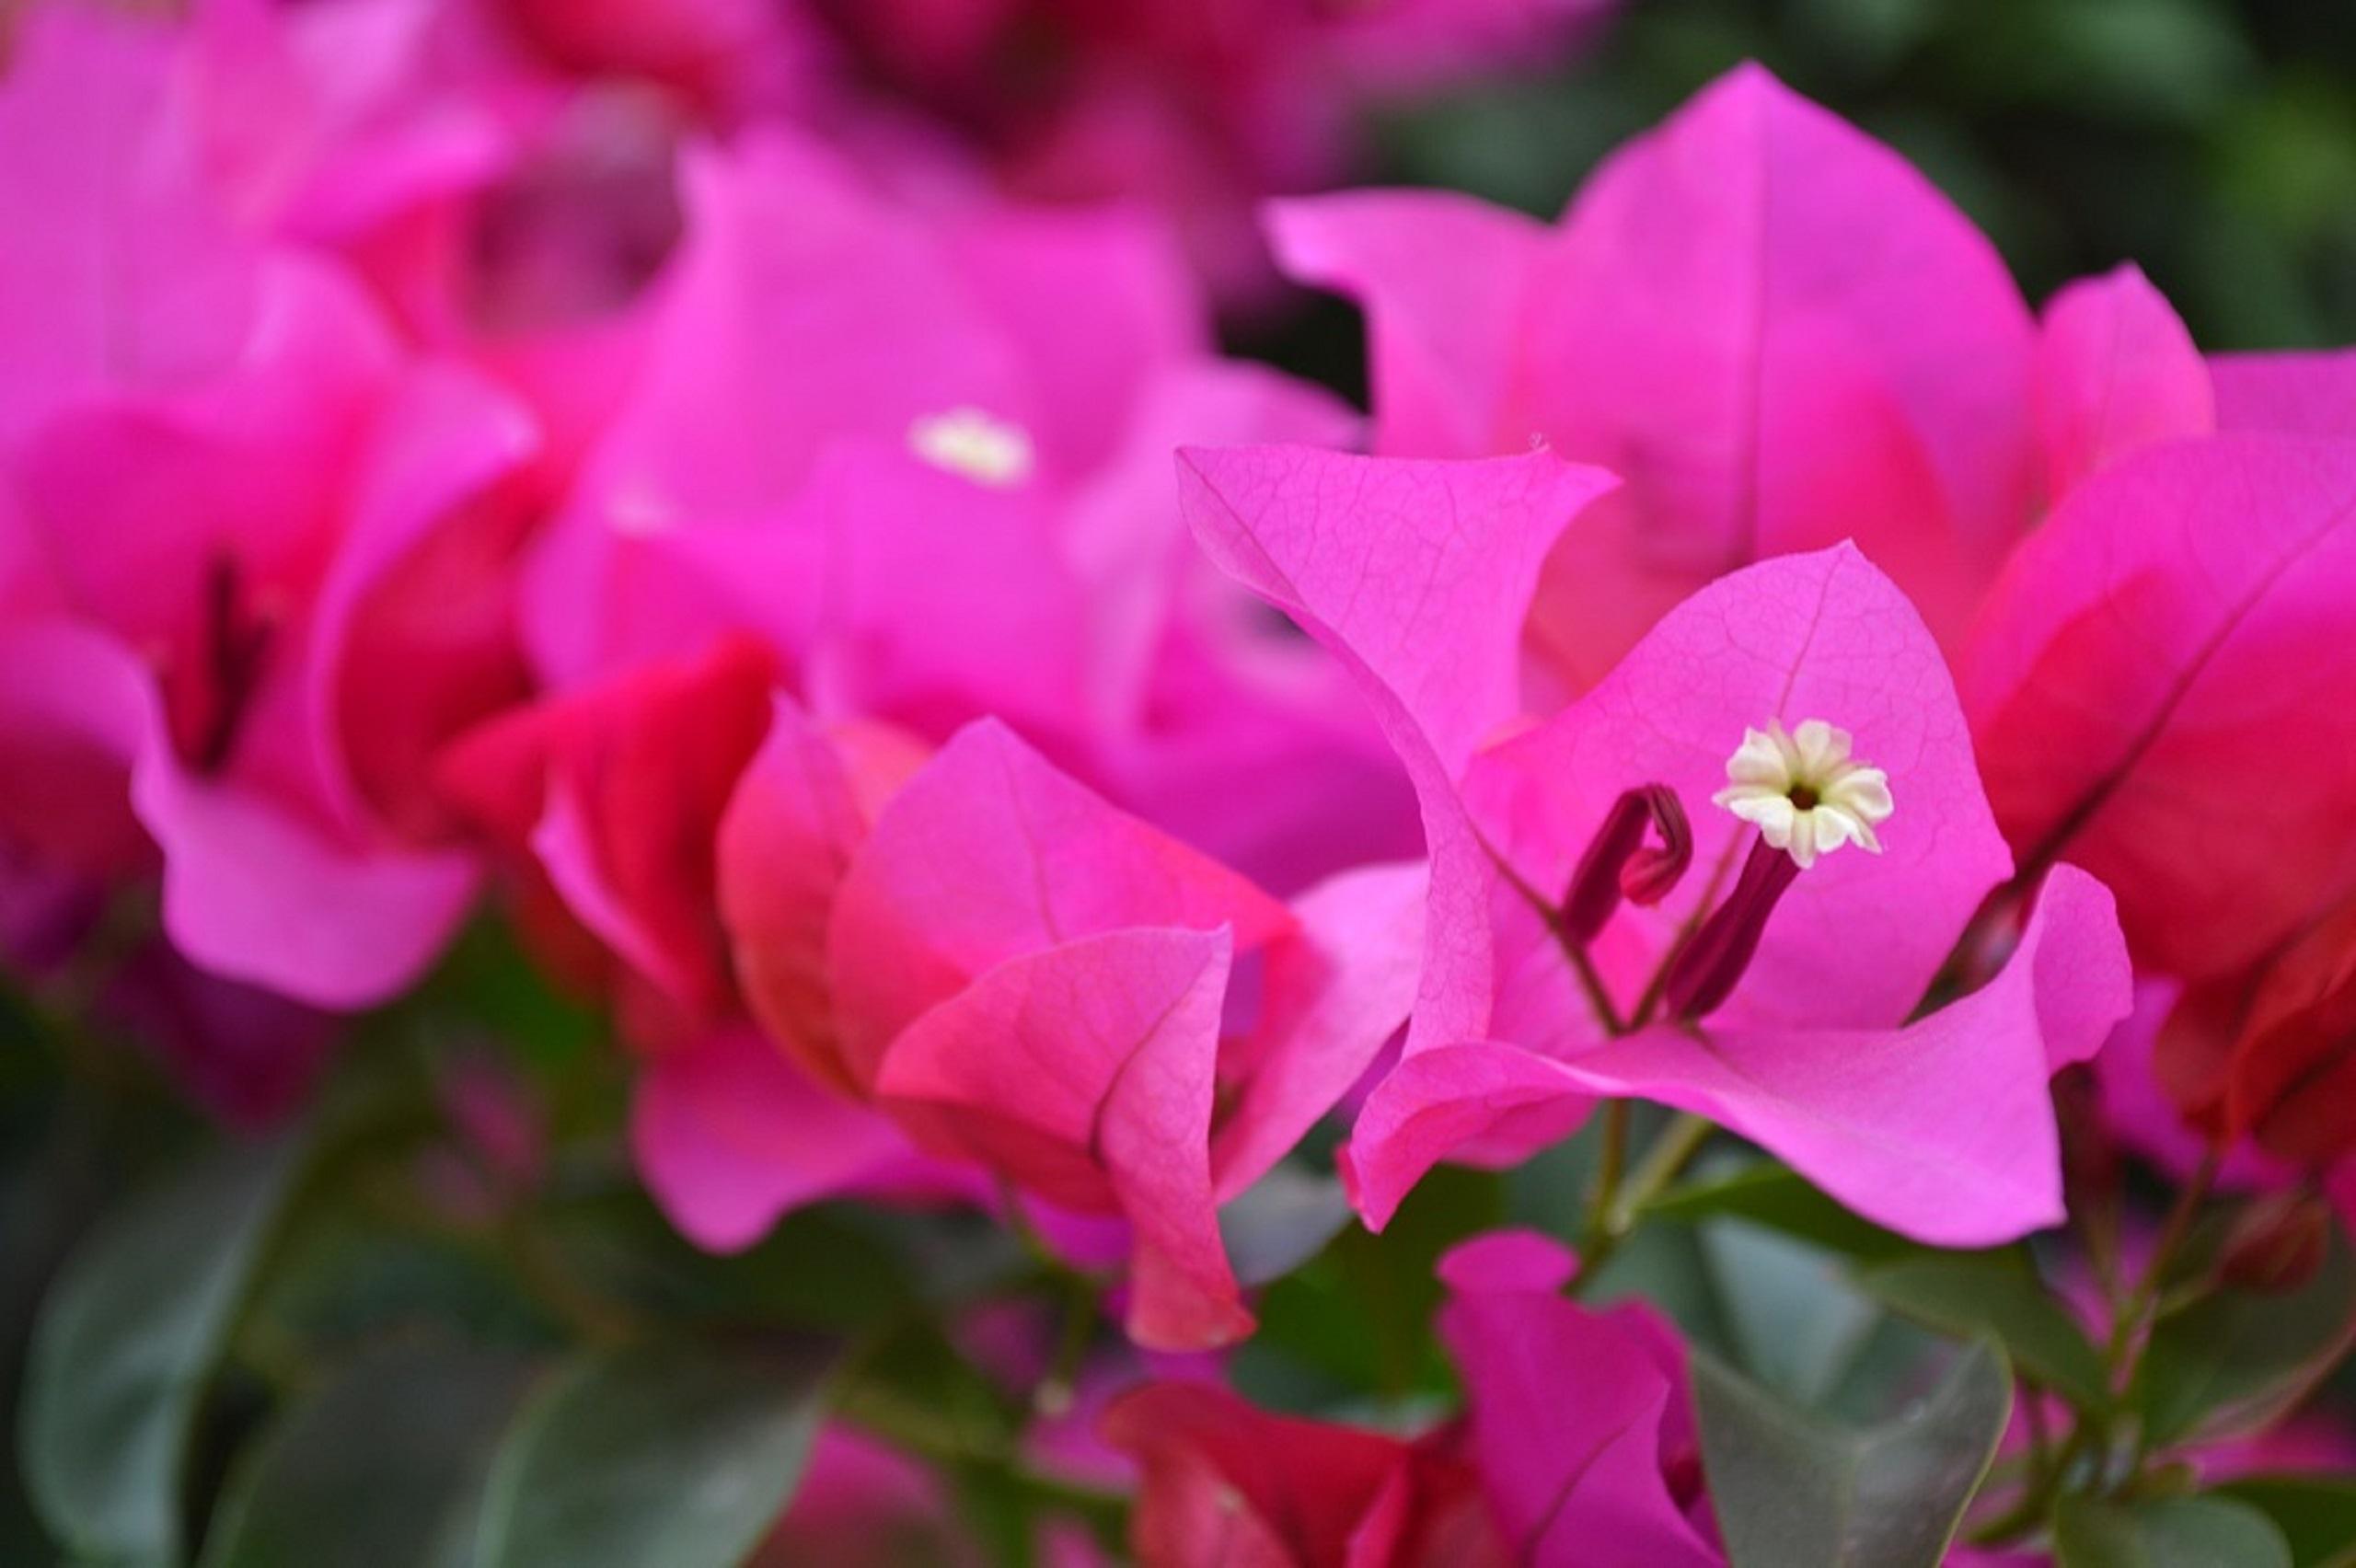 flores de bugambilia rosa